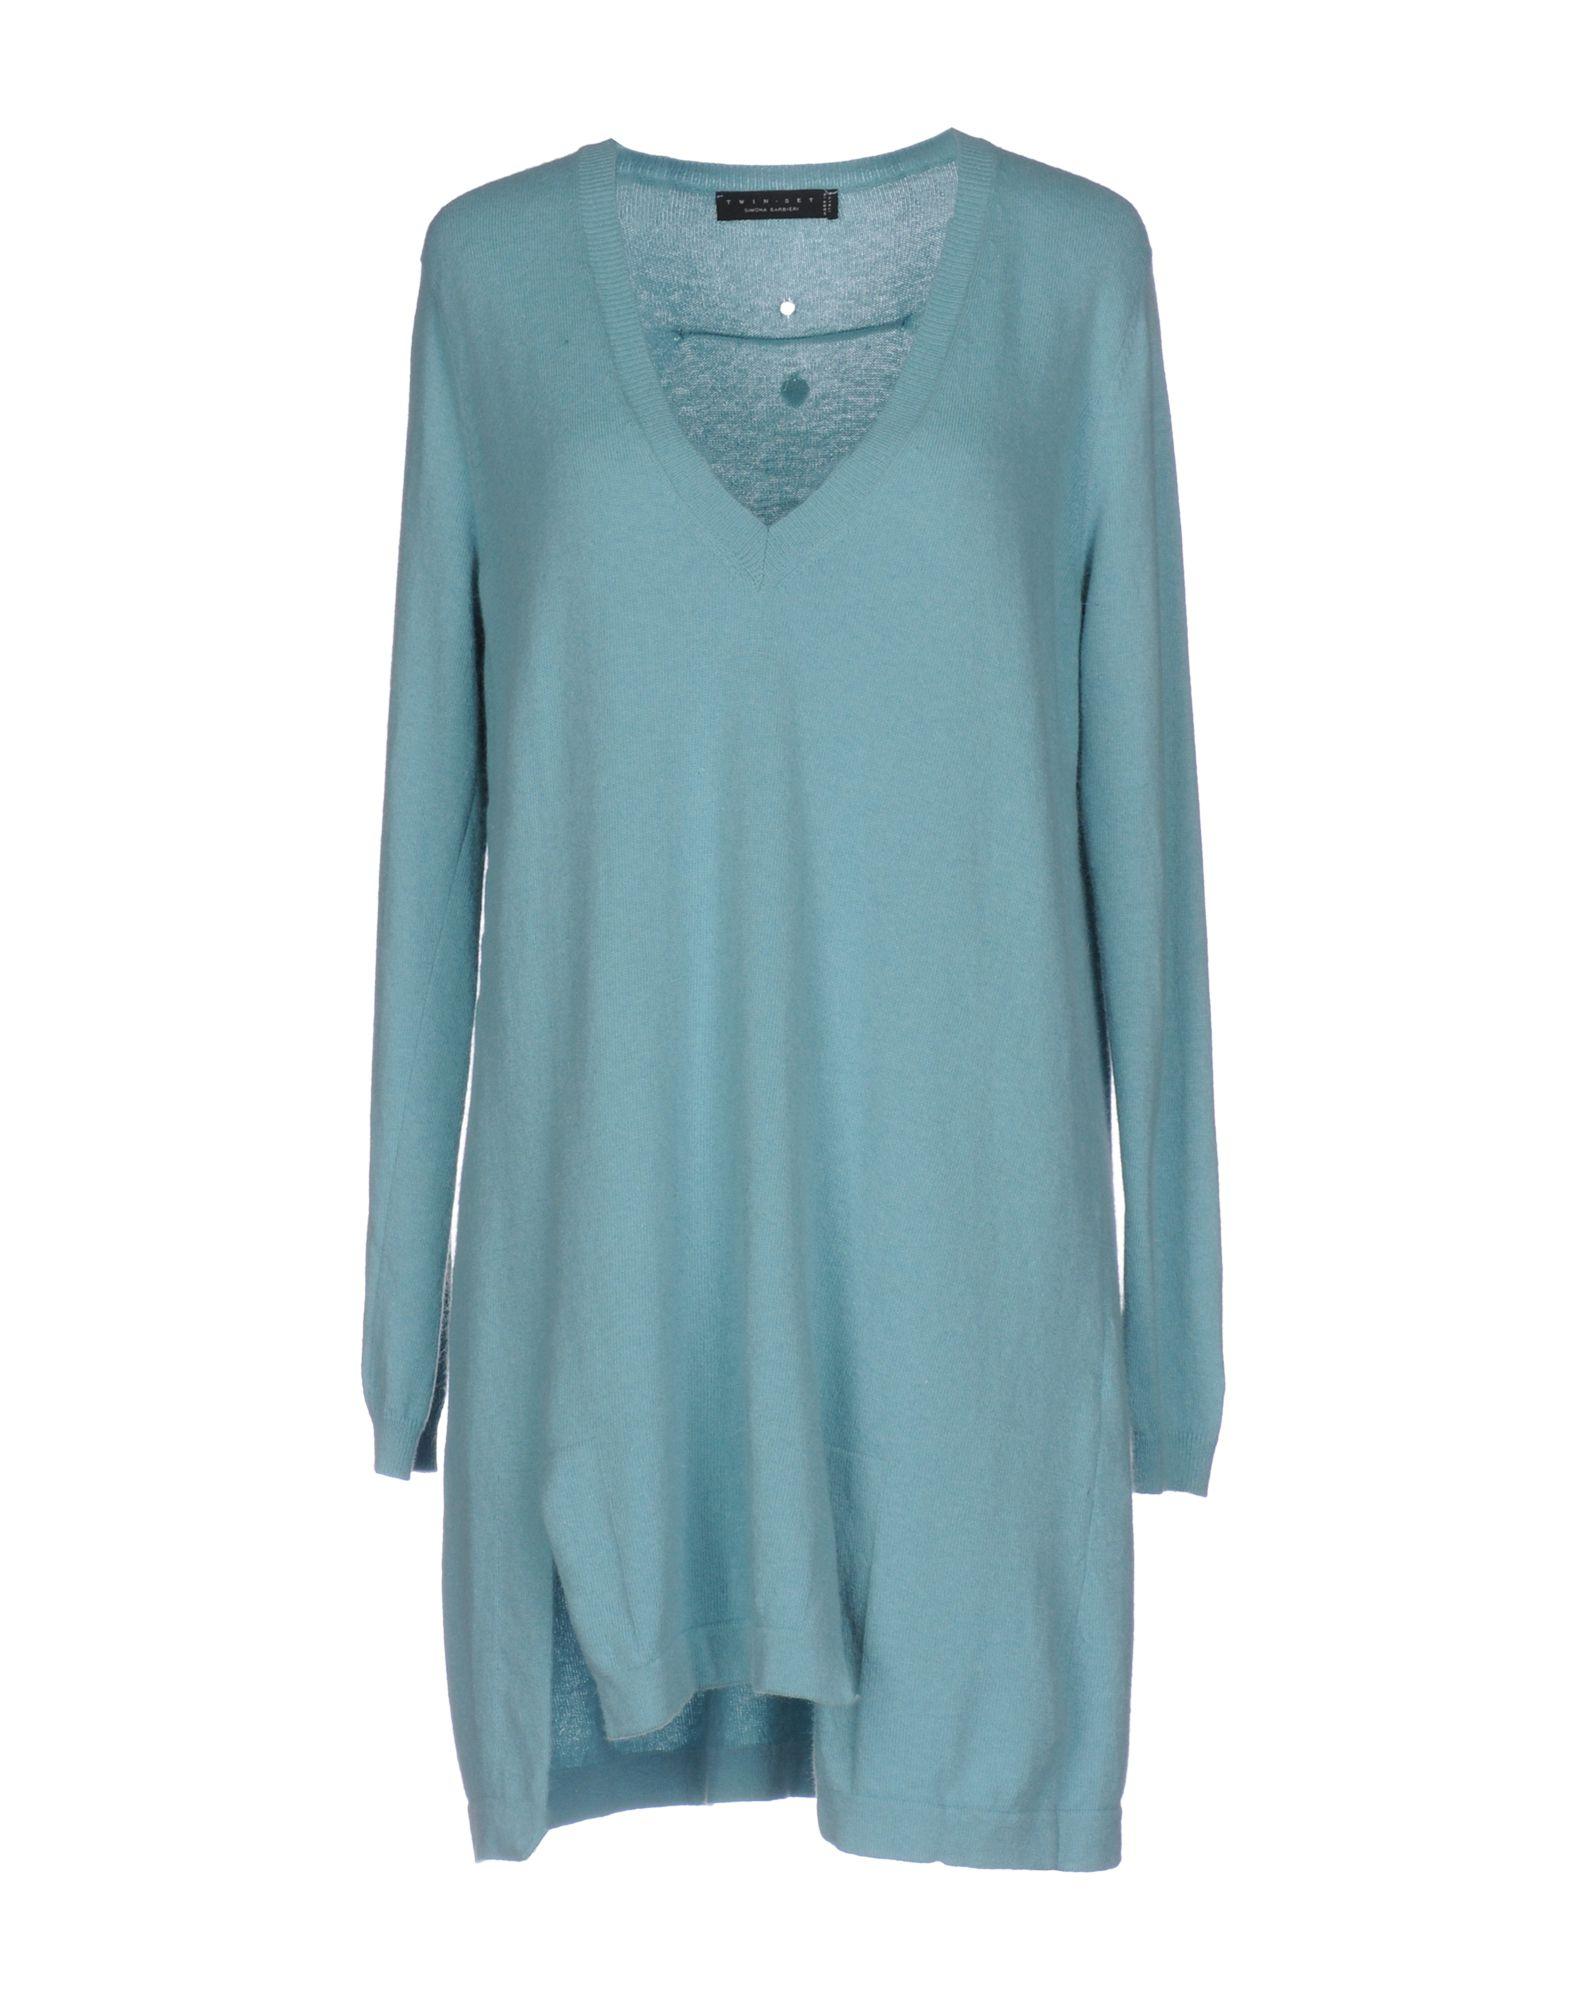 TWIN-SET Simona Barbieri Damen Pullover Farbe Himmelblau Größe 6 - broschei